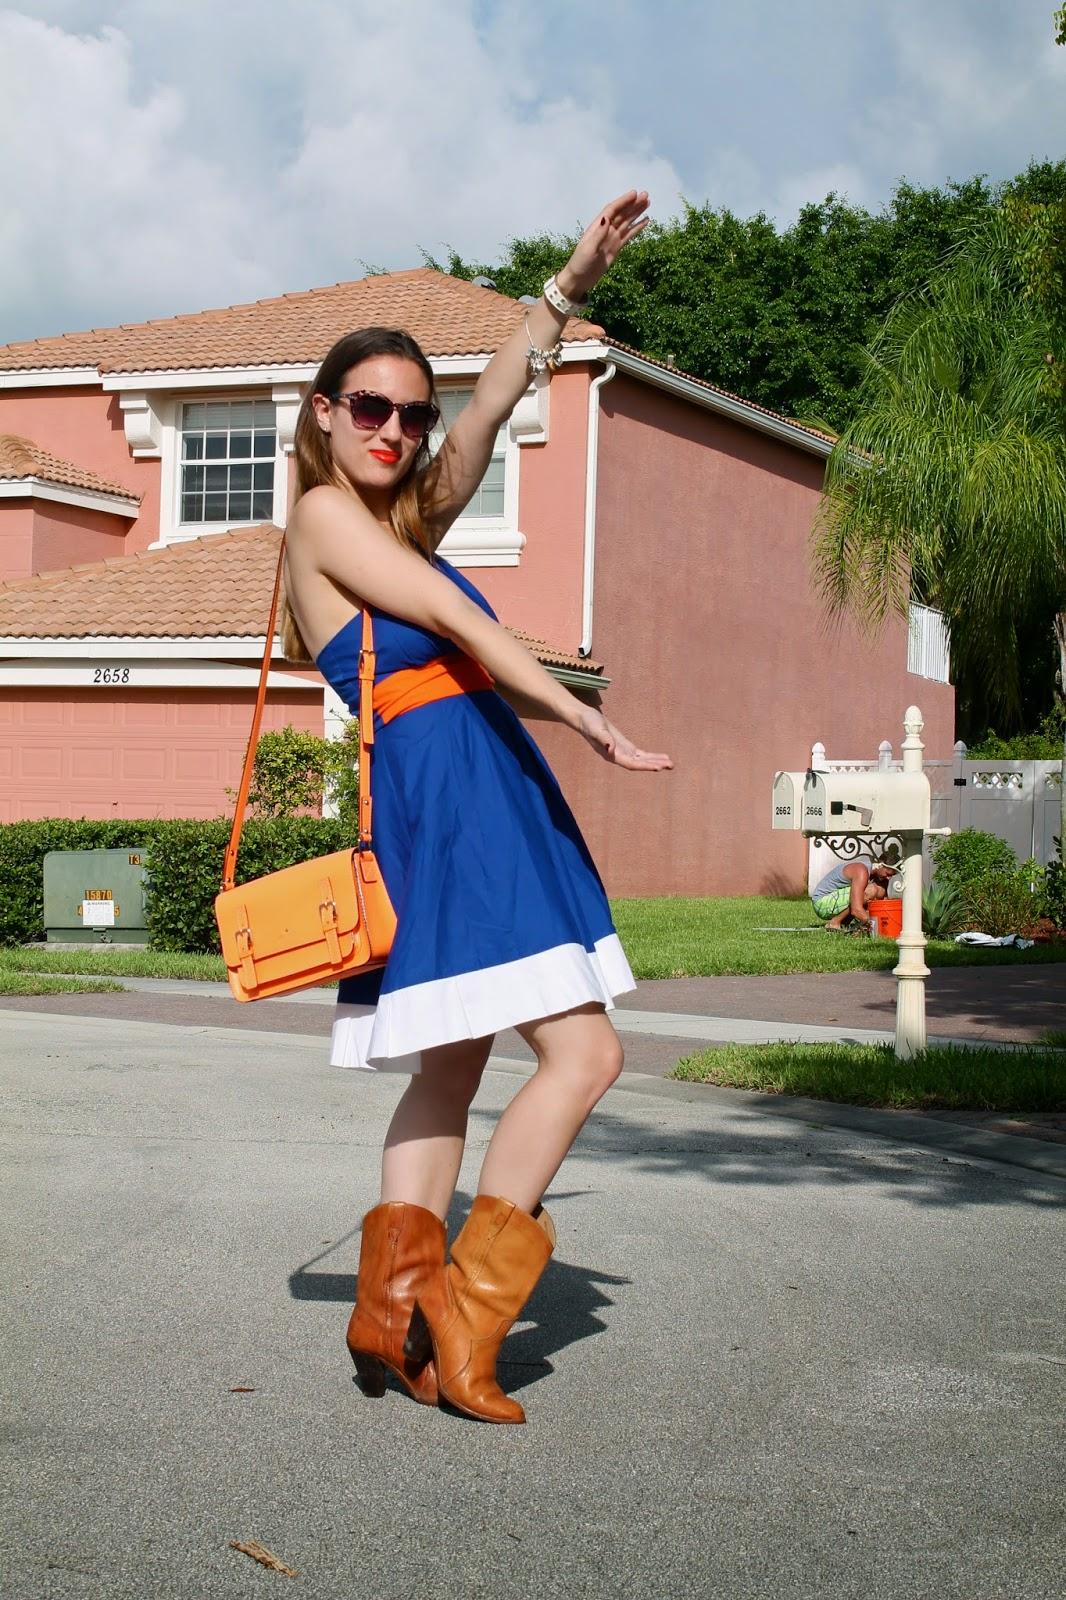 Natalie Kim, Kate Spade, consignment, Nordstrom, Brighton, classic, preppy, game day, college football, southern, feminine, Miami fashion blogger, Gator fashion, fashion, style